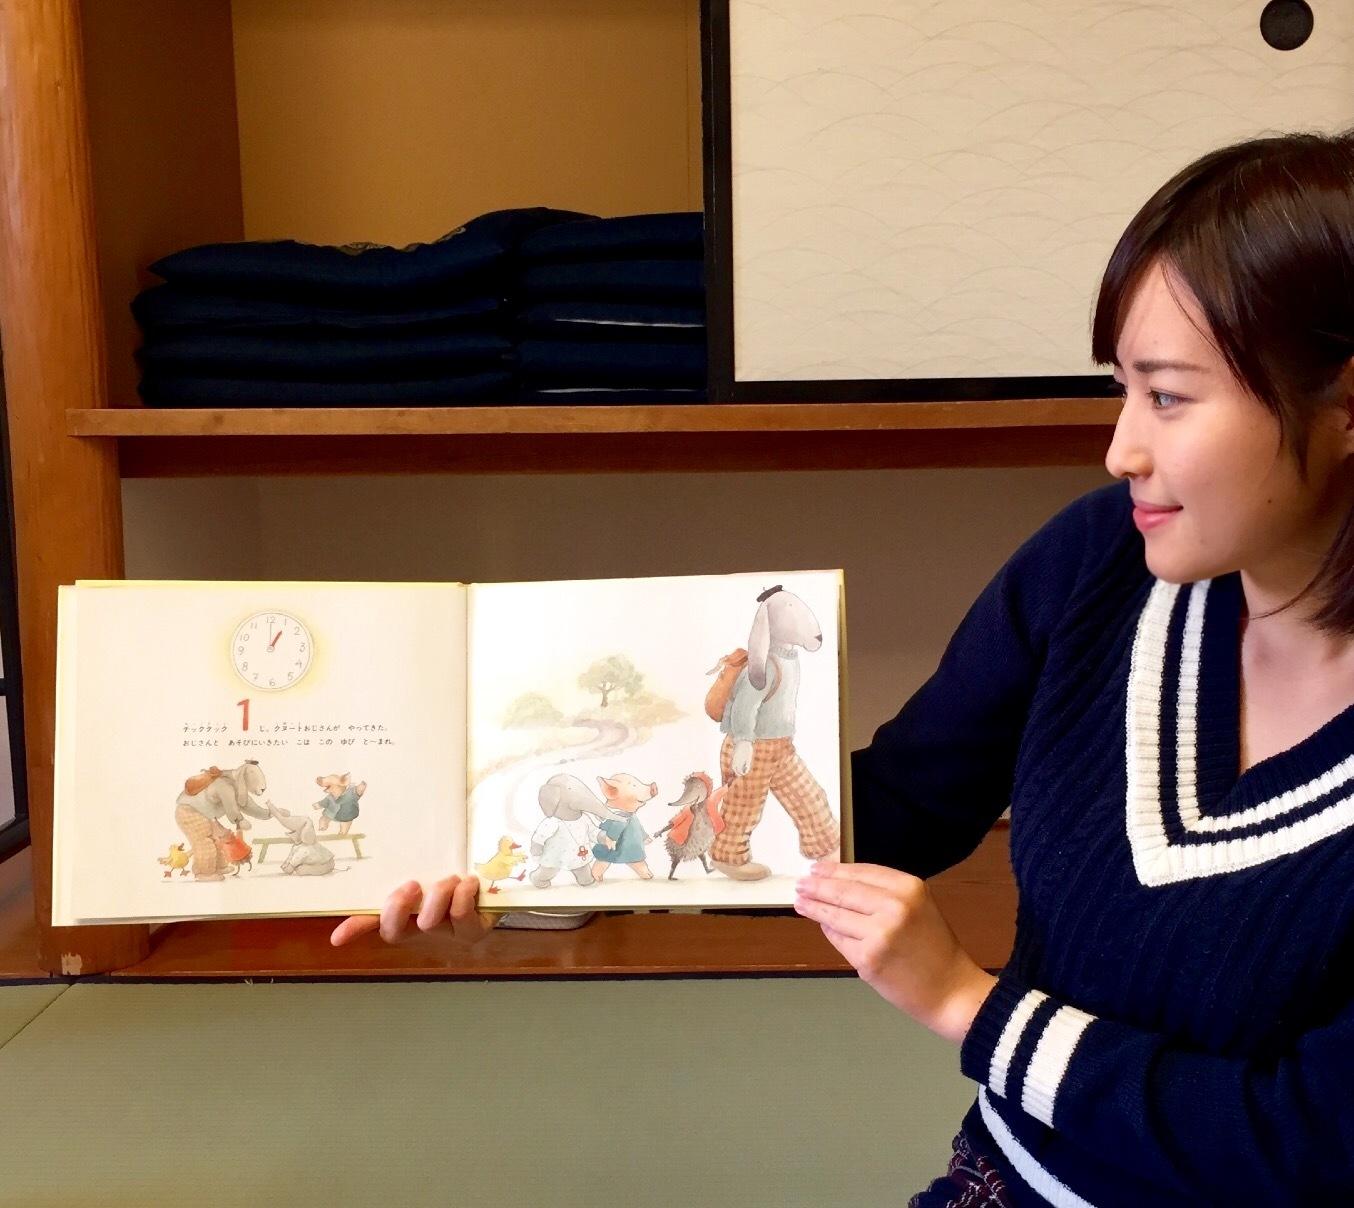 大学生のJIMOTO EYE「絵本」_d0029276_12140806.jpeg